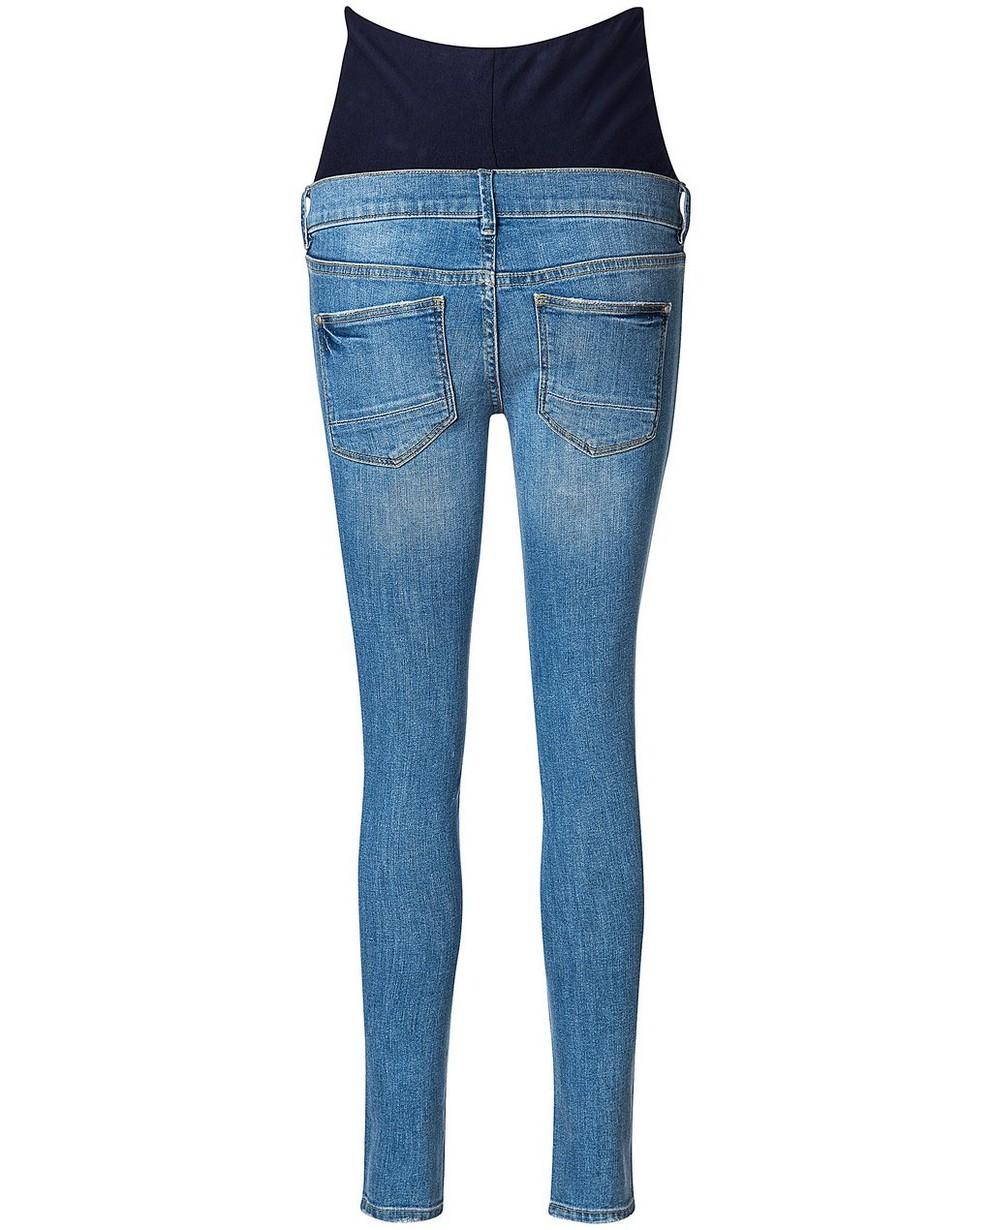 Jeans - BLL - Skinny jeans ZORA